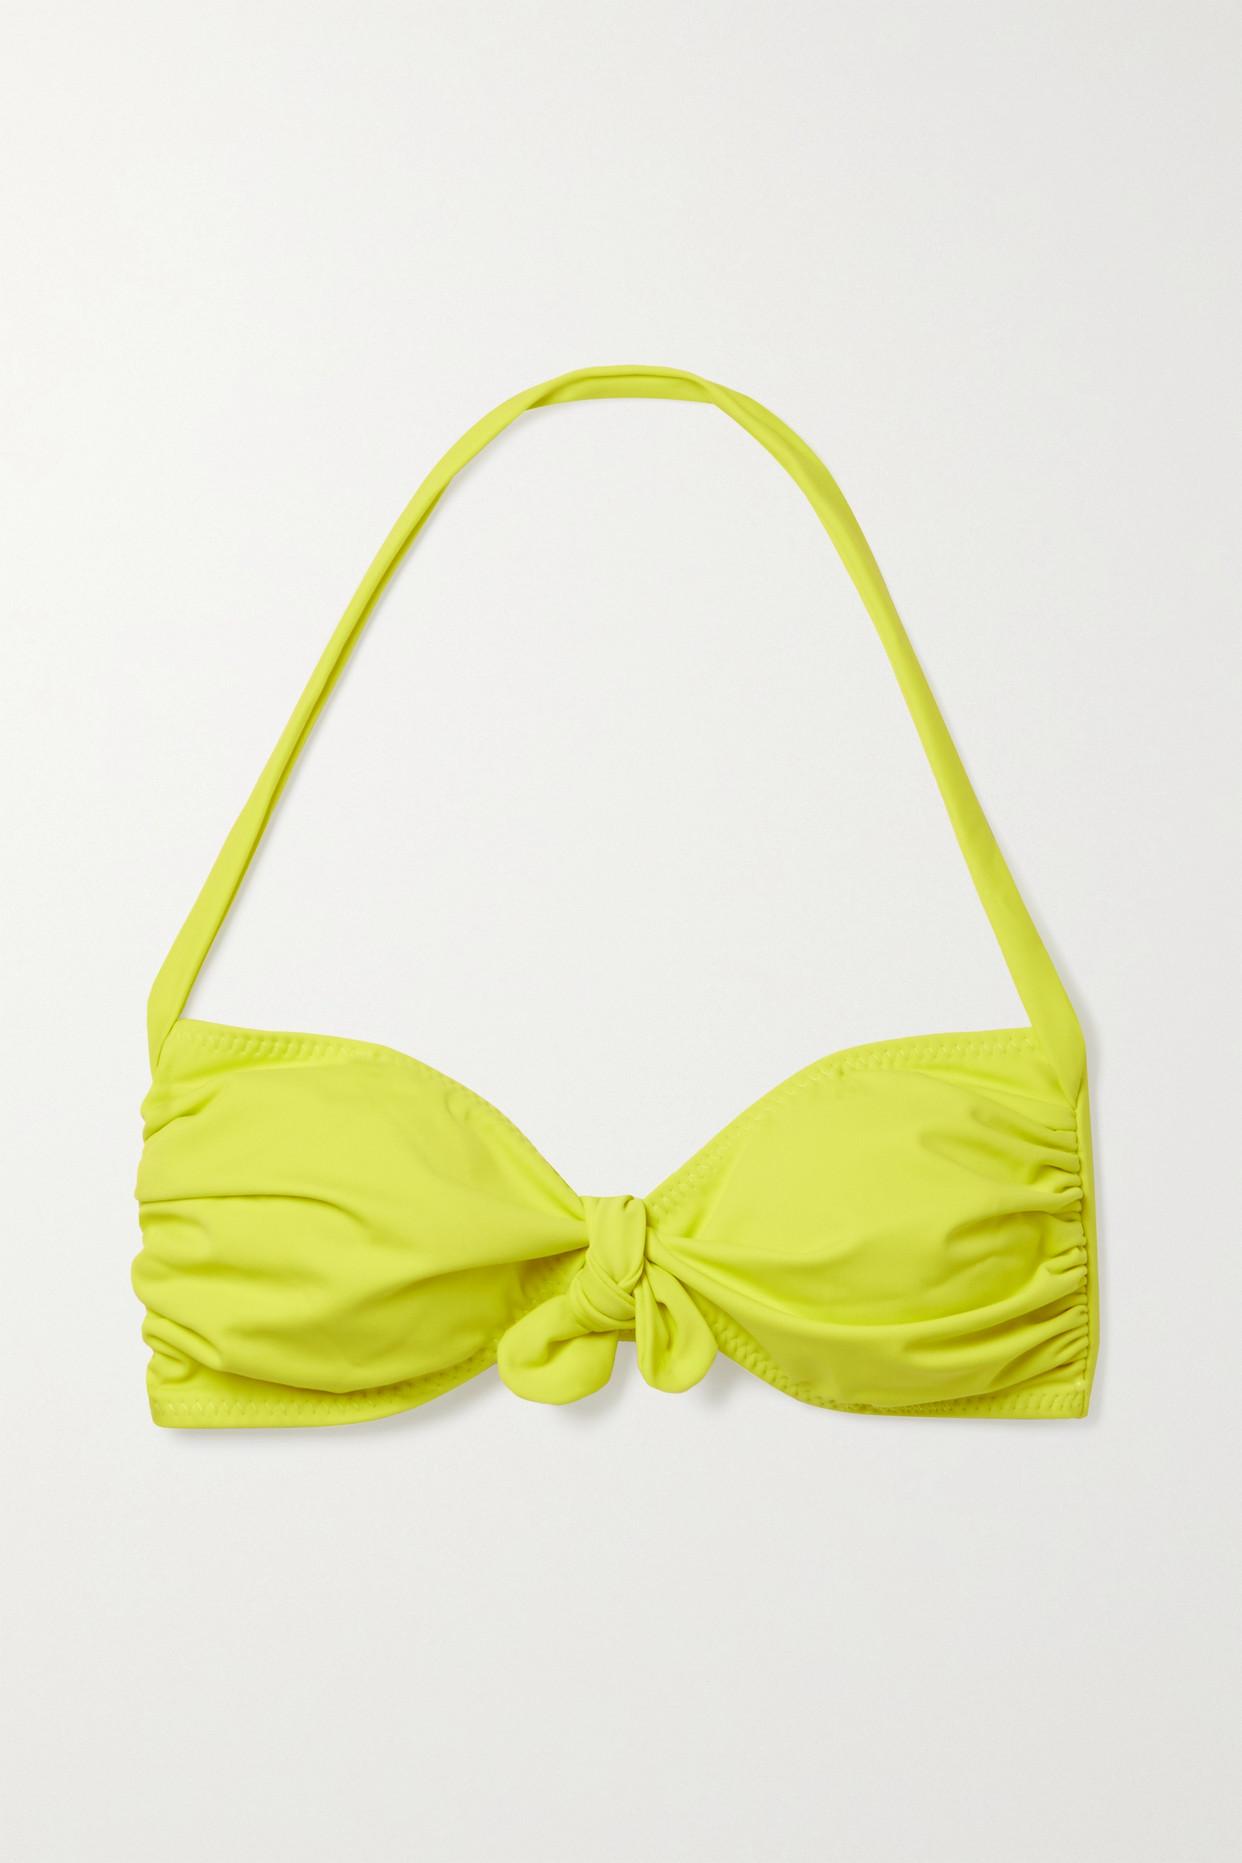 NORMA KAMALI - Tie-front Ruched Halterneck Bikini Top - Yellow - x small